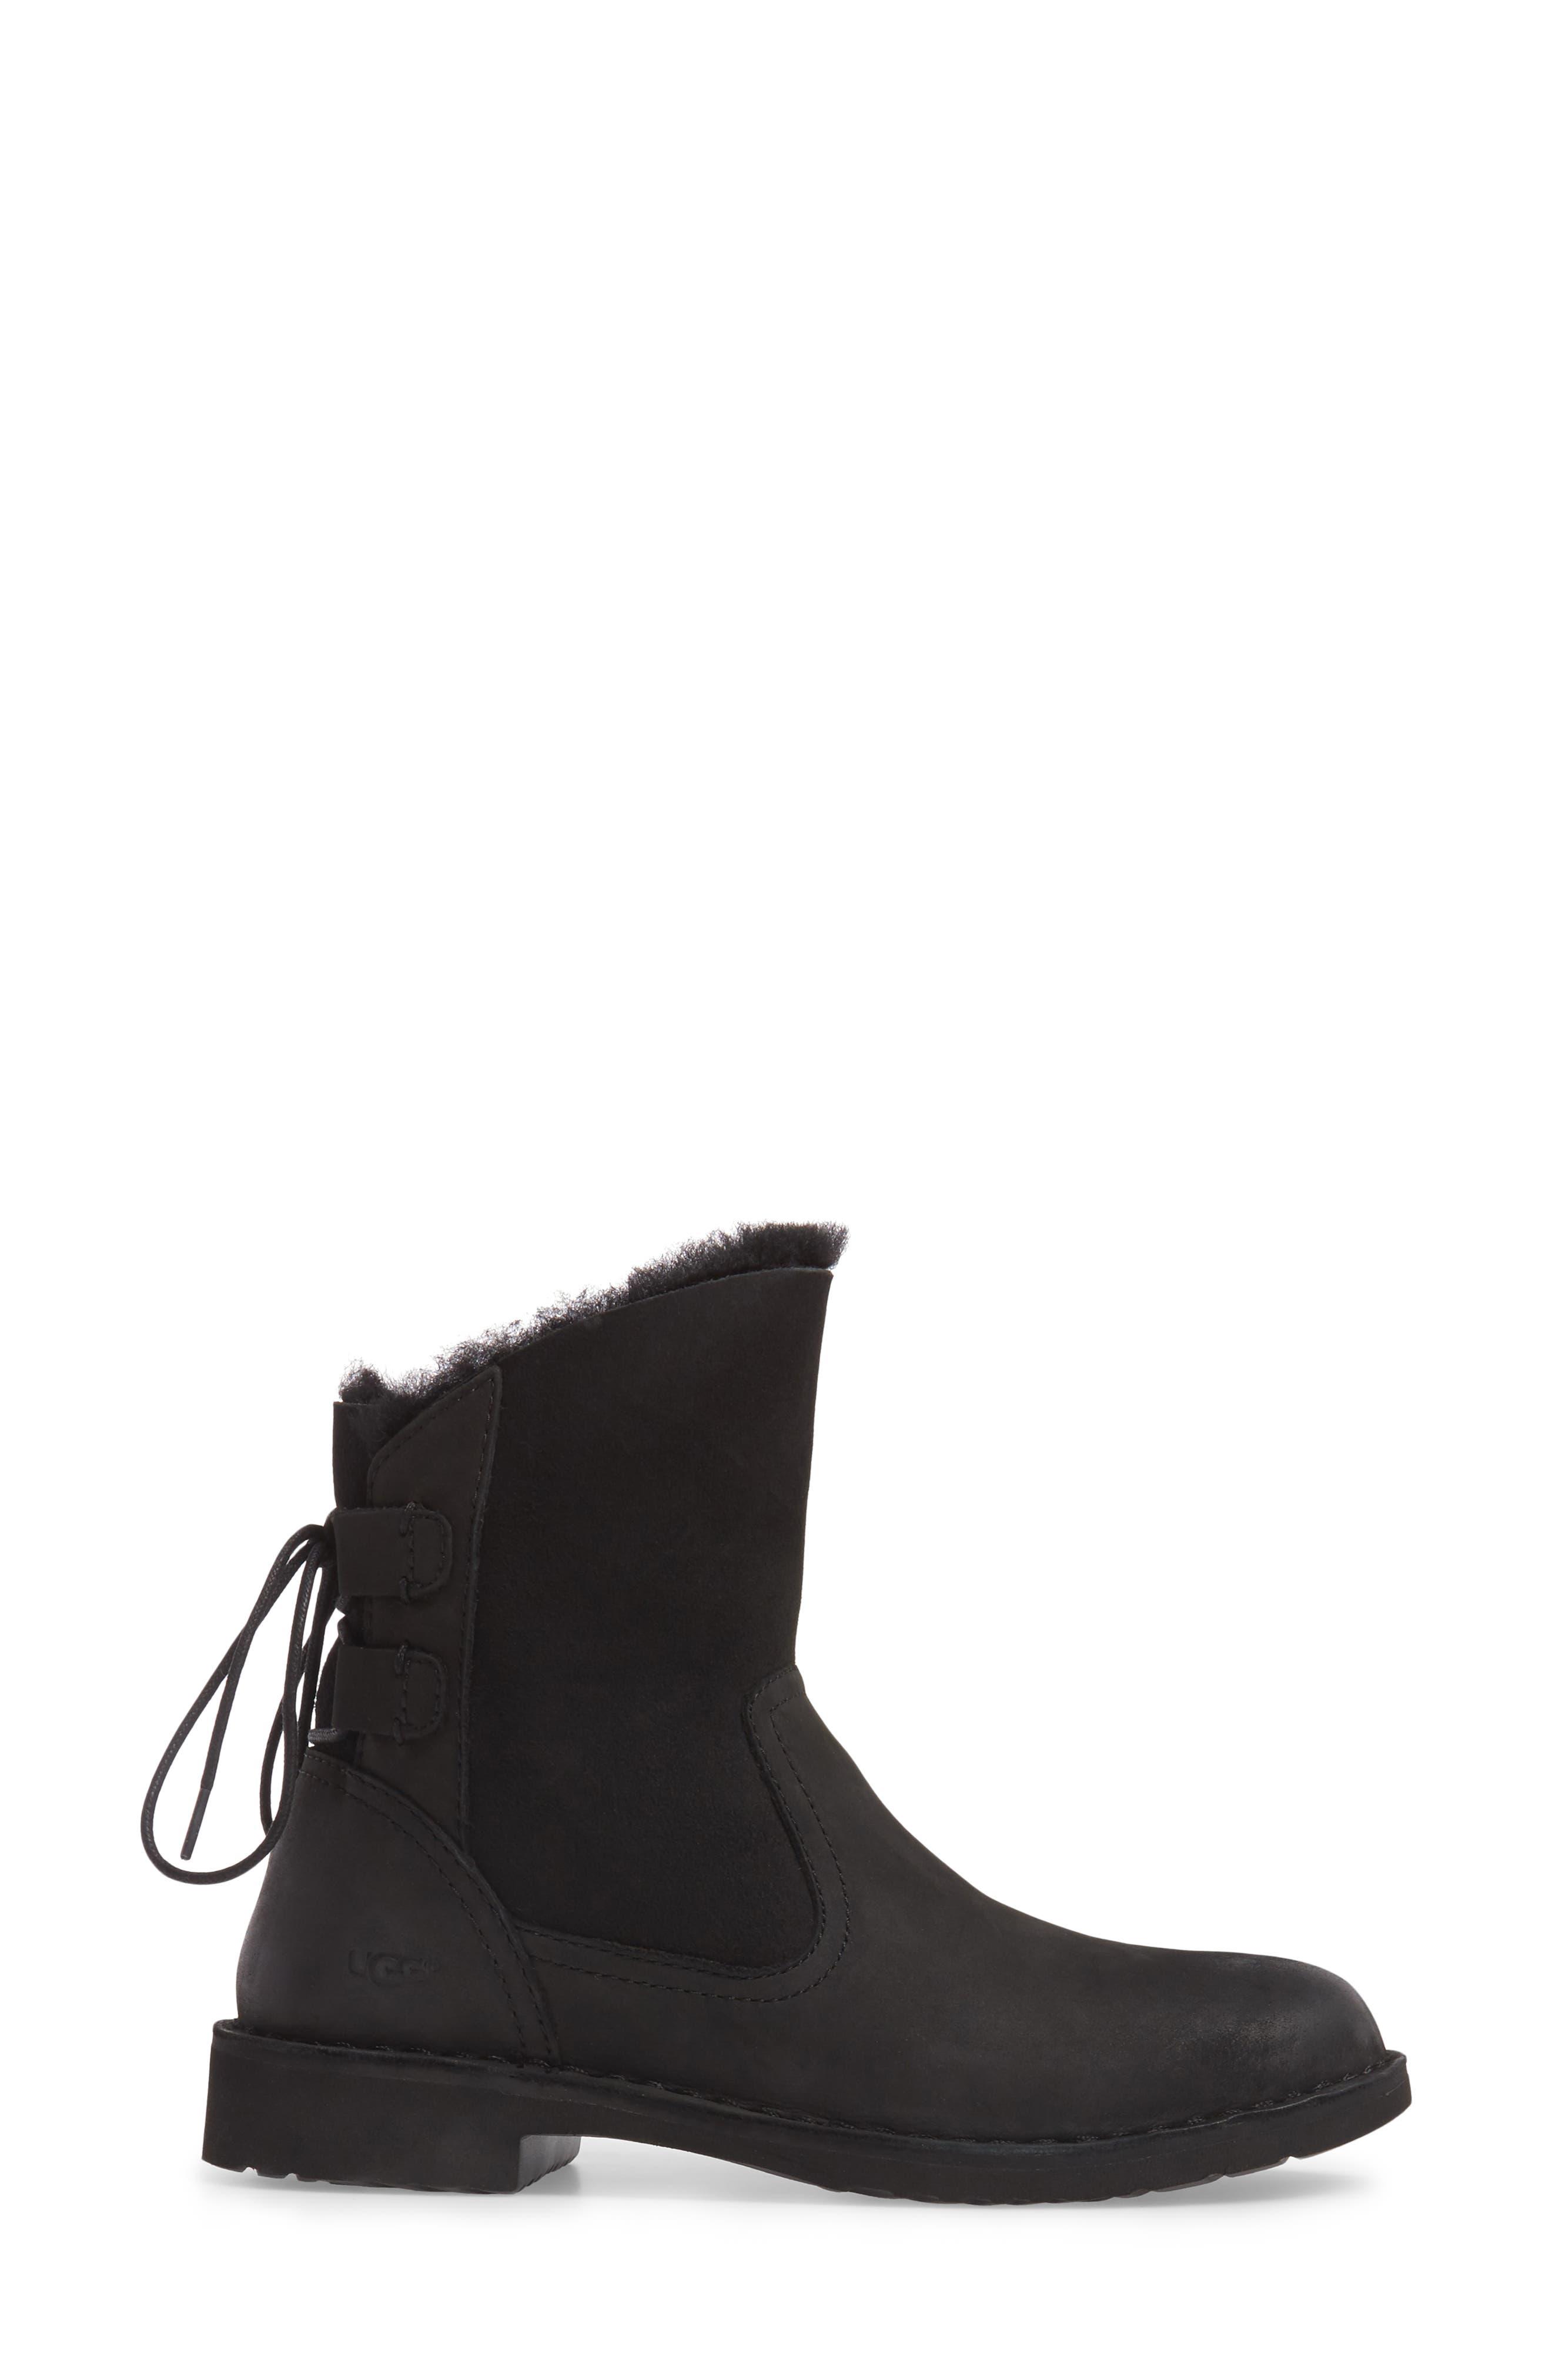 Naiyah Lace-Back Genuine Shearling Boot,                             Alternate thumbnail 3, color,                             BLACK/ BLACK NUBUCK LEATHER